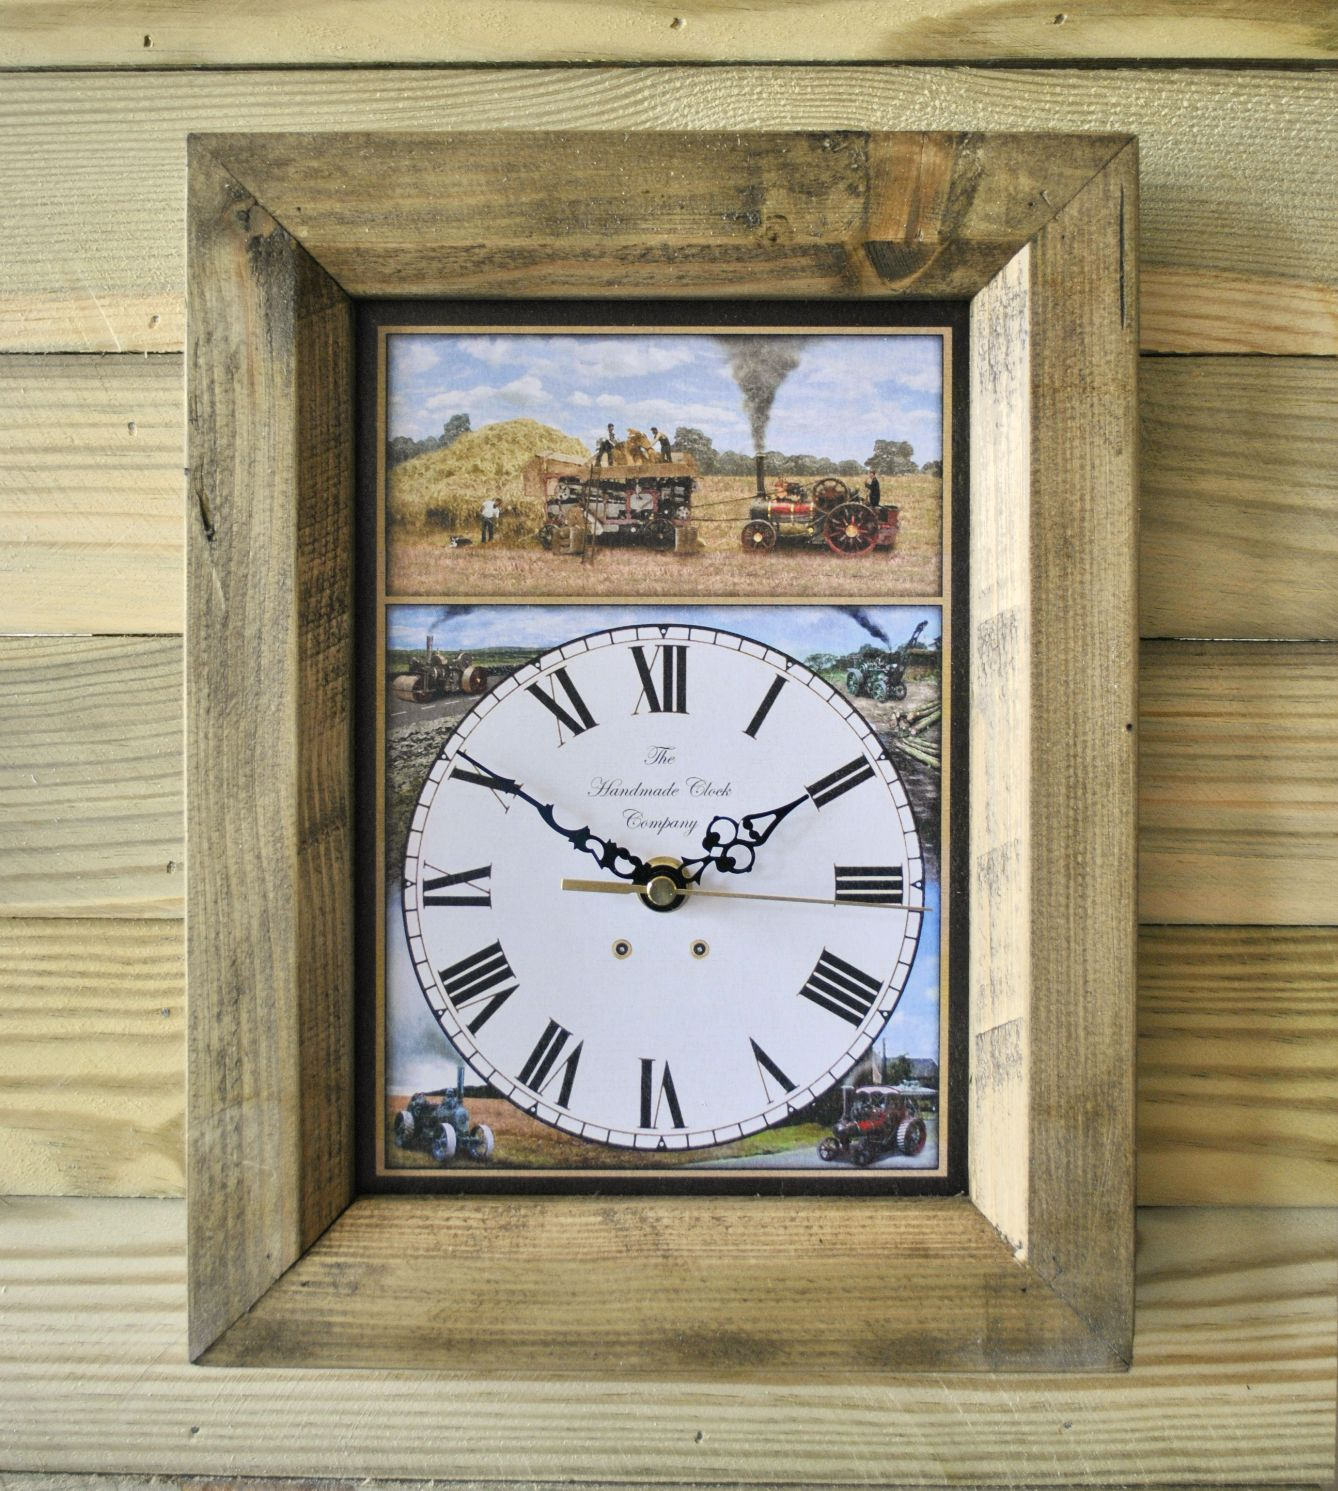 The Handmade Furniture Company Rustic Steam Threshing Handmade Wooden Wall  Clock, £19.99